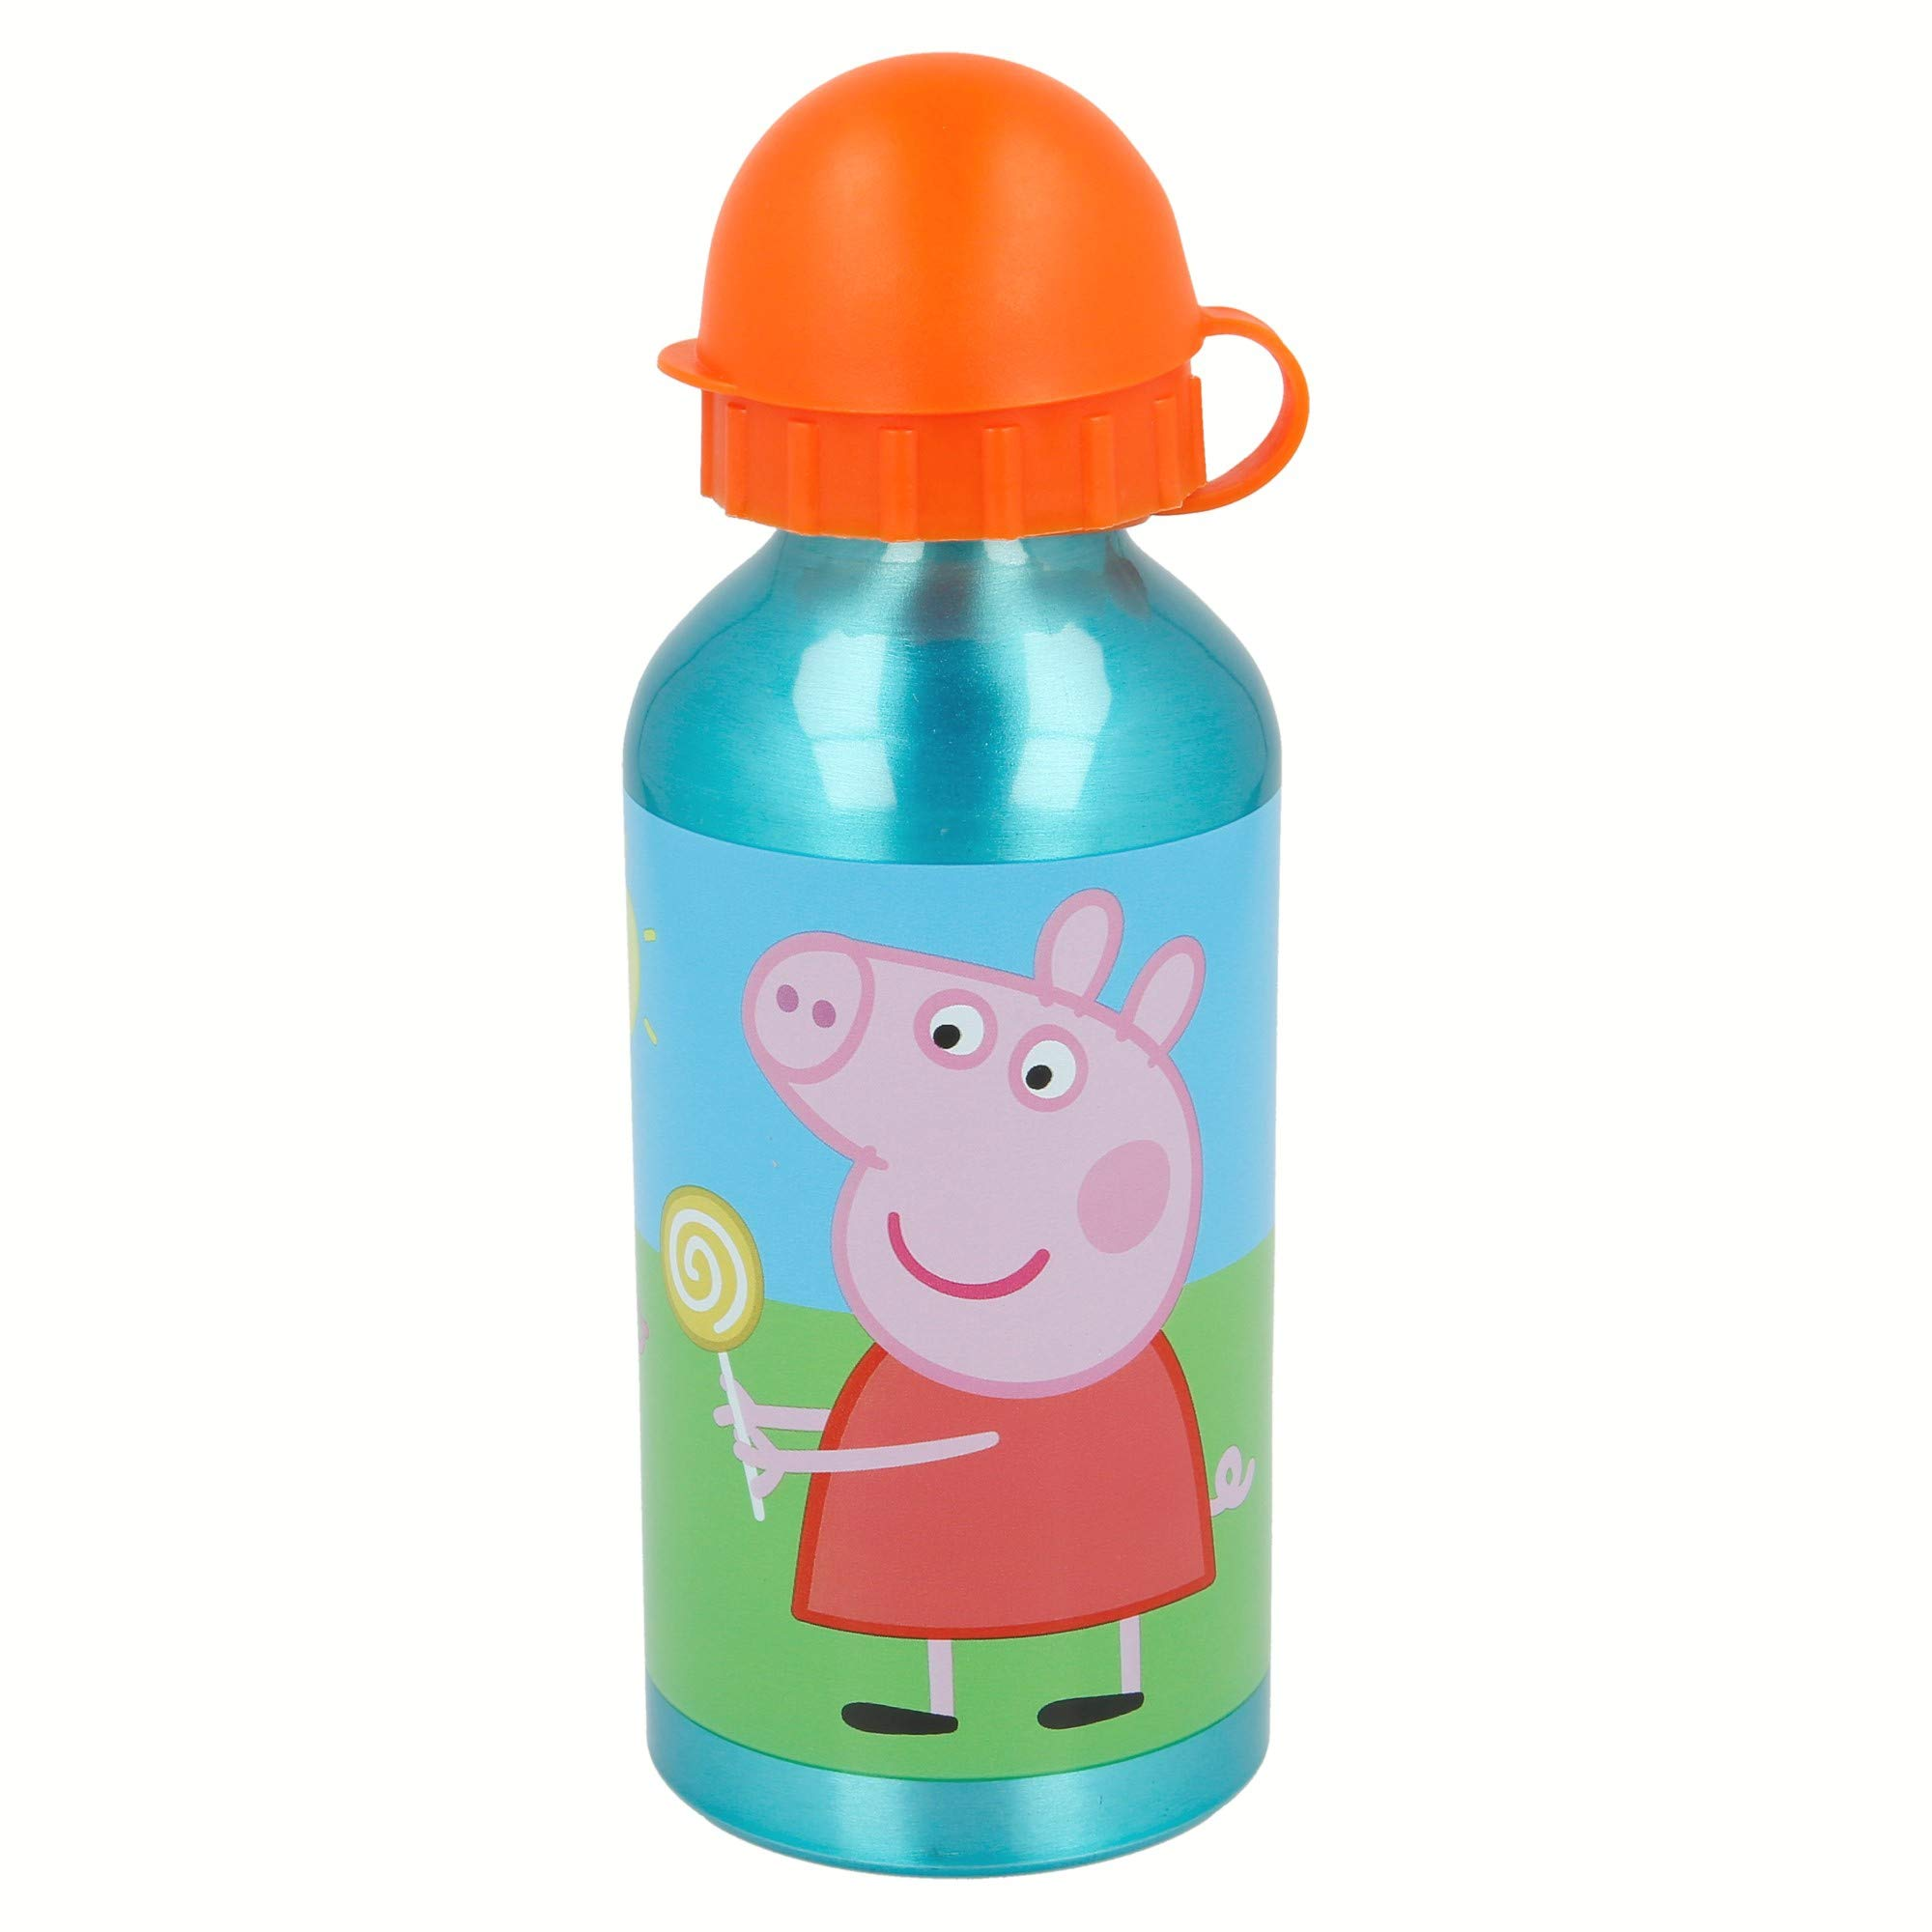 Stor: Peppa Pig - Amazon.es